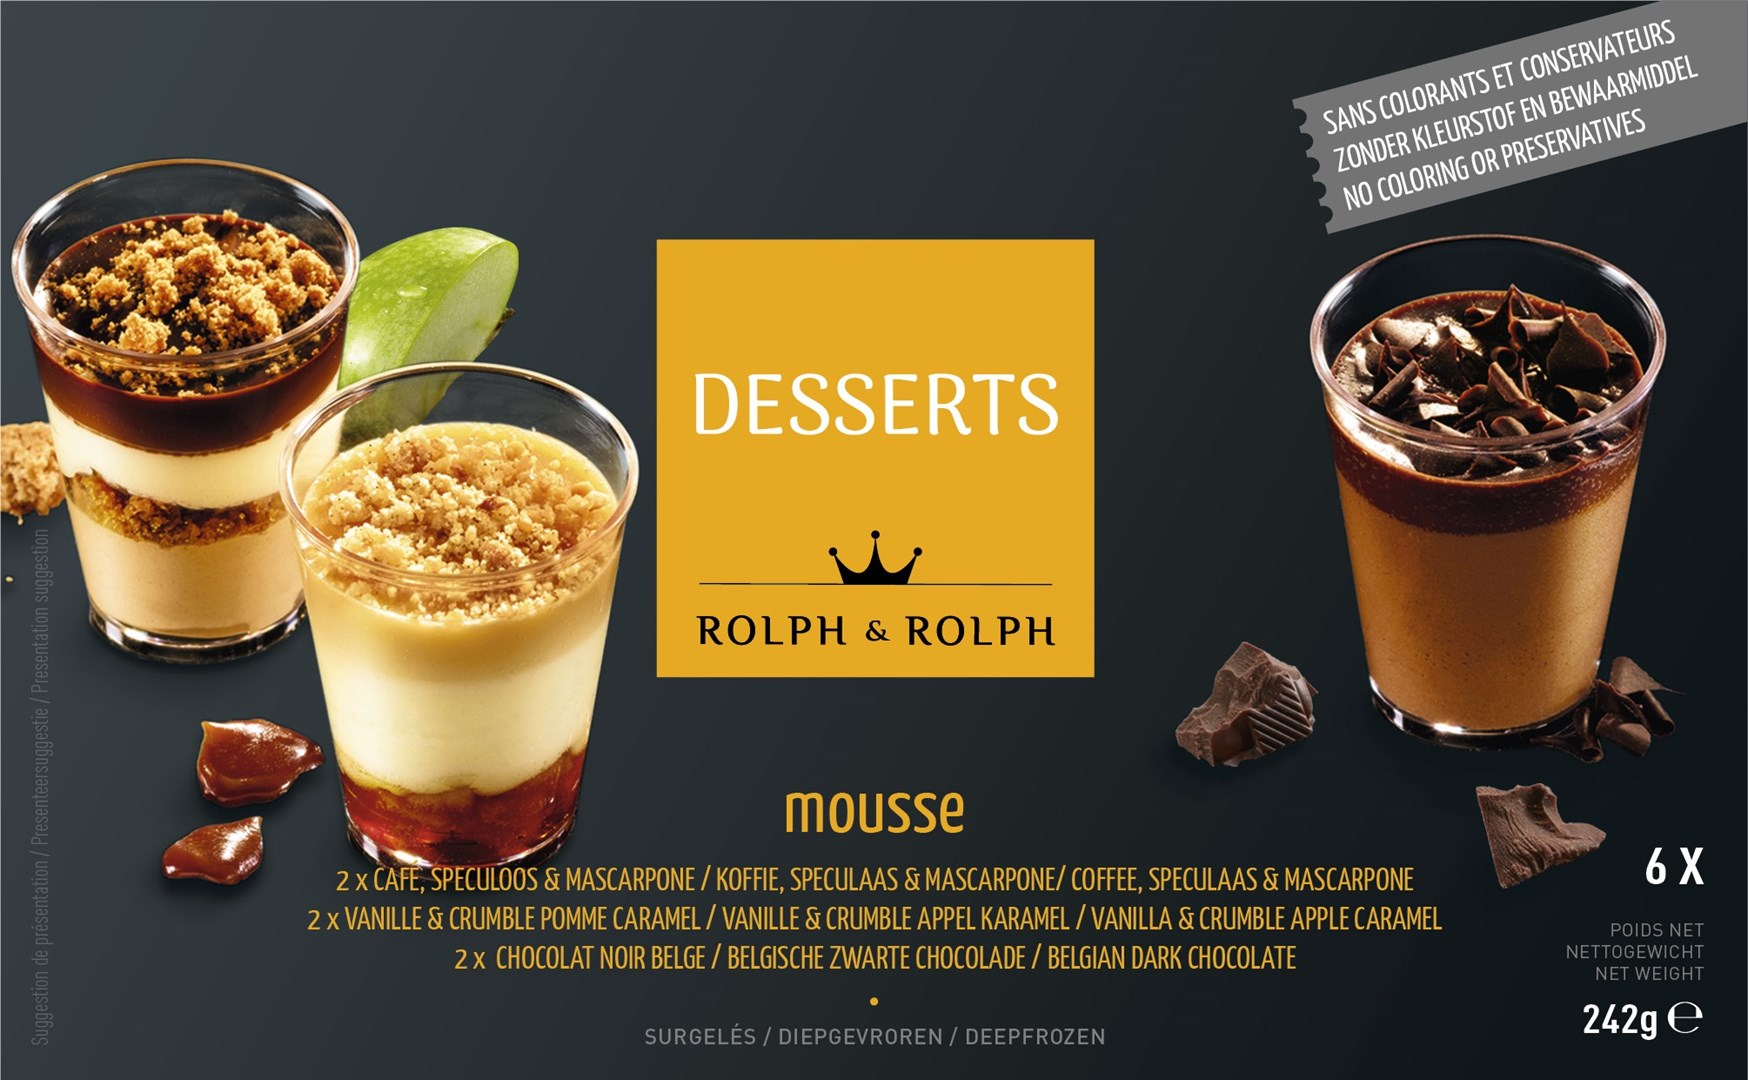 Productafbeelding Desserts 2x Koffie-Speculaas-Mascarpone, 2x Vanille-Appel-Crumble, 2x Belgische zwarte chocolade